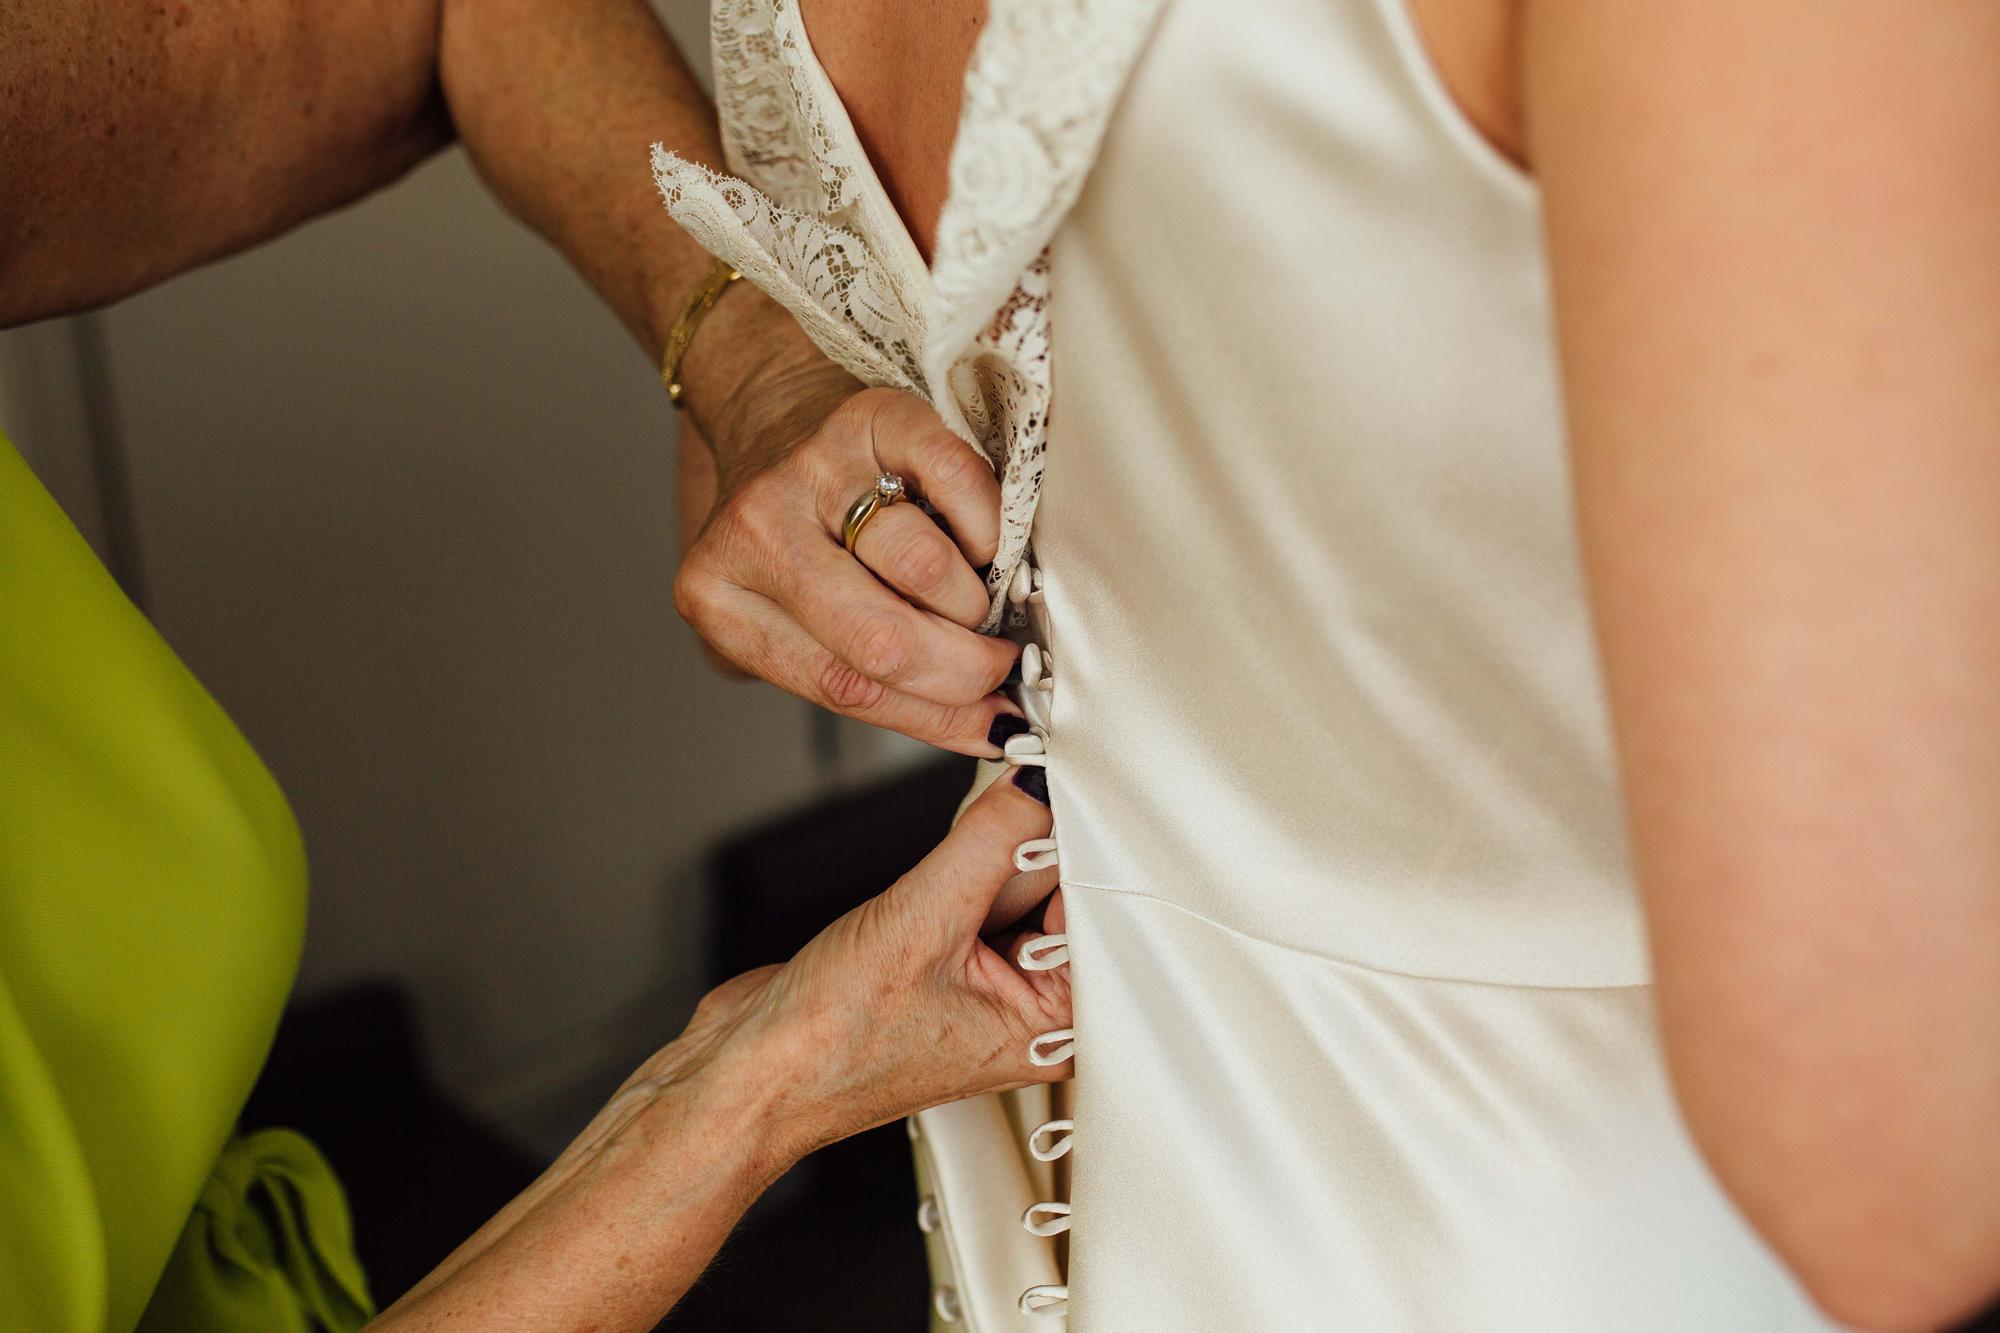 Sarah-Honeysuckle-Bias-Cut-Silk-Vintage-Inspired-Wedding-Gown-Sheffield-Wedding-Kate-Beaumont-2.jpg